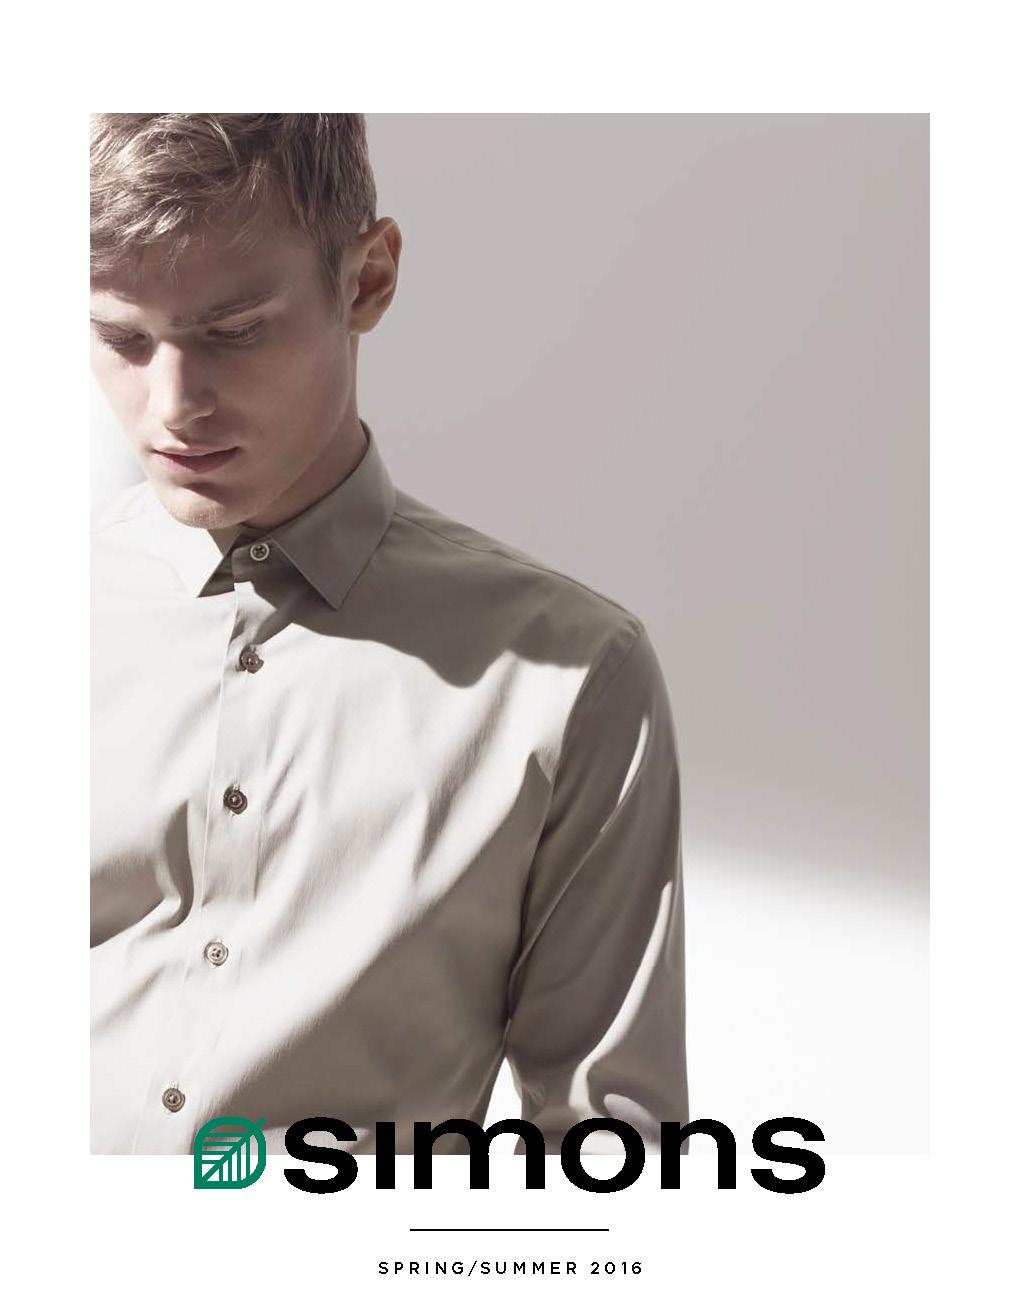 1e13dfed8d9f Simons-Fashion-MEN Page 01